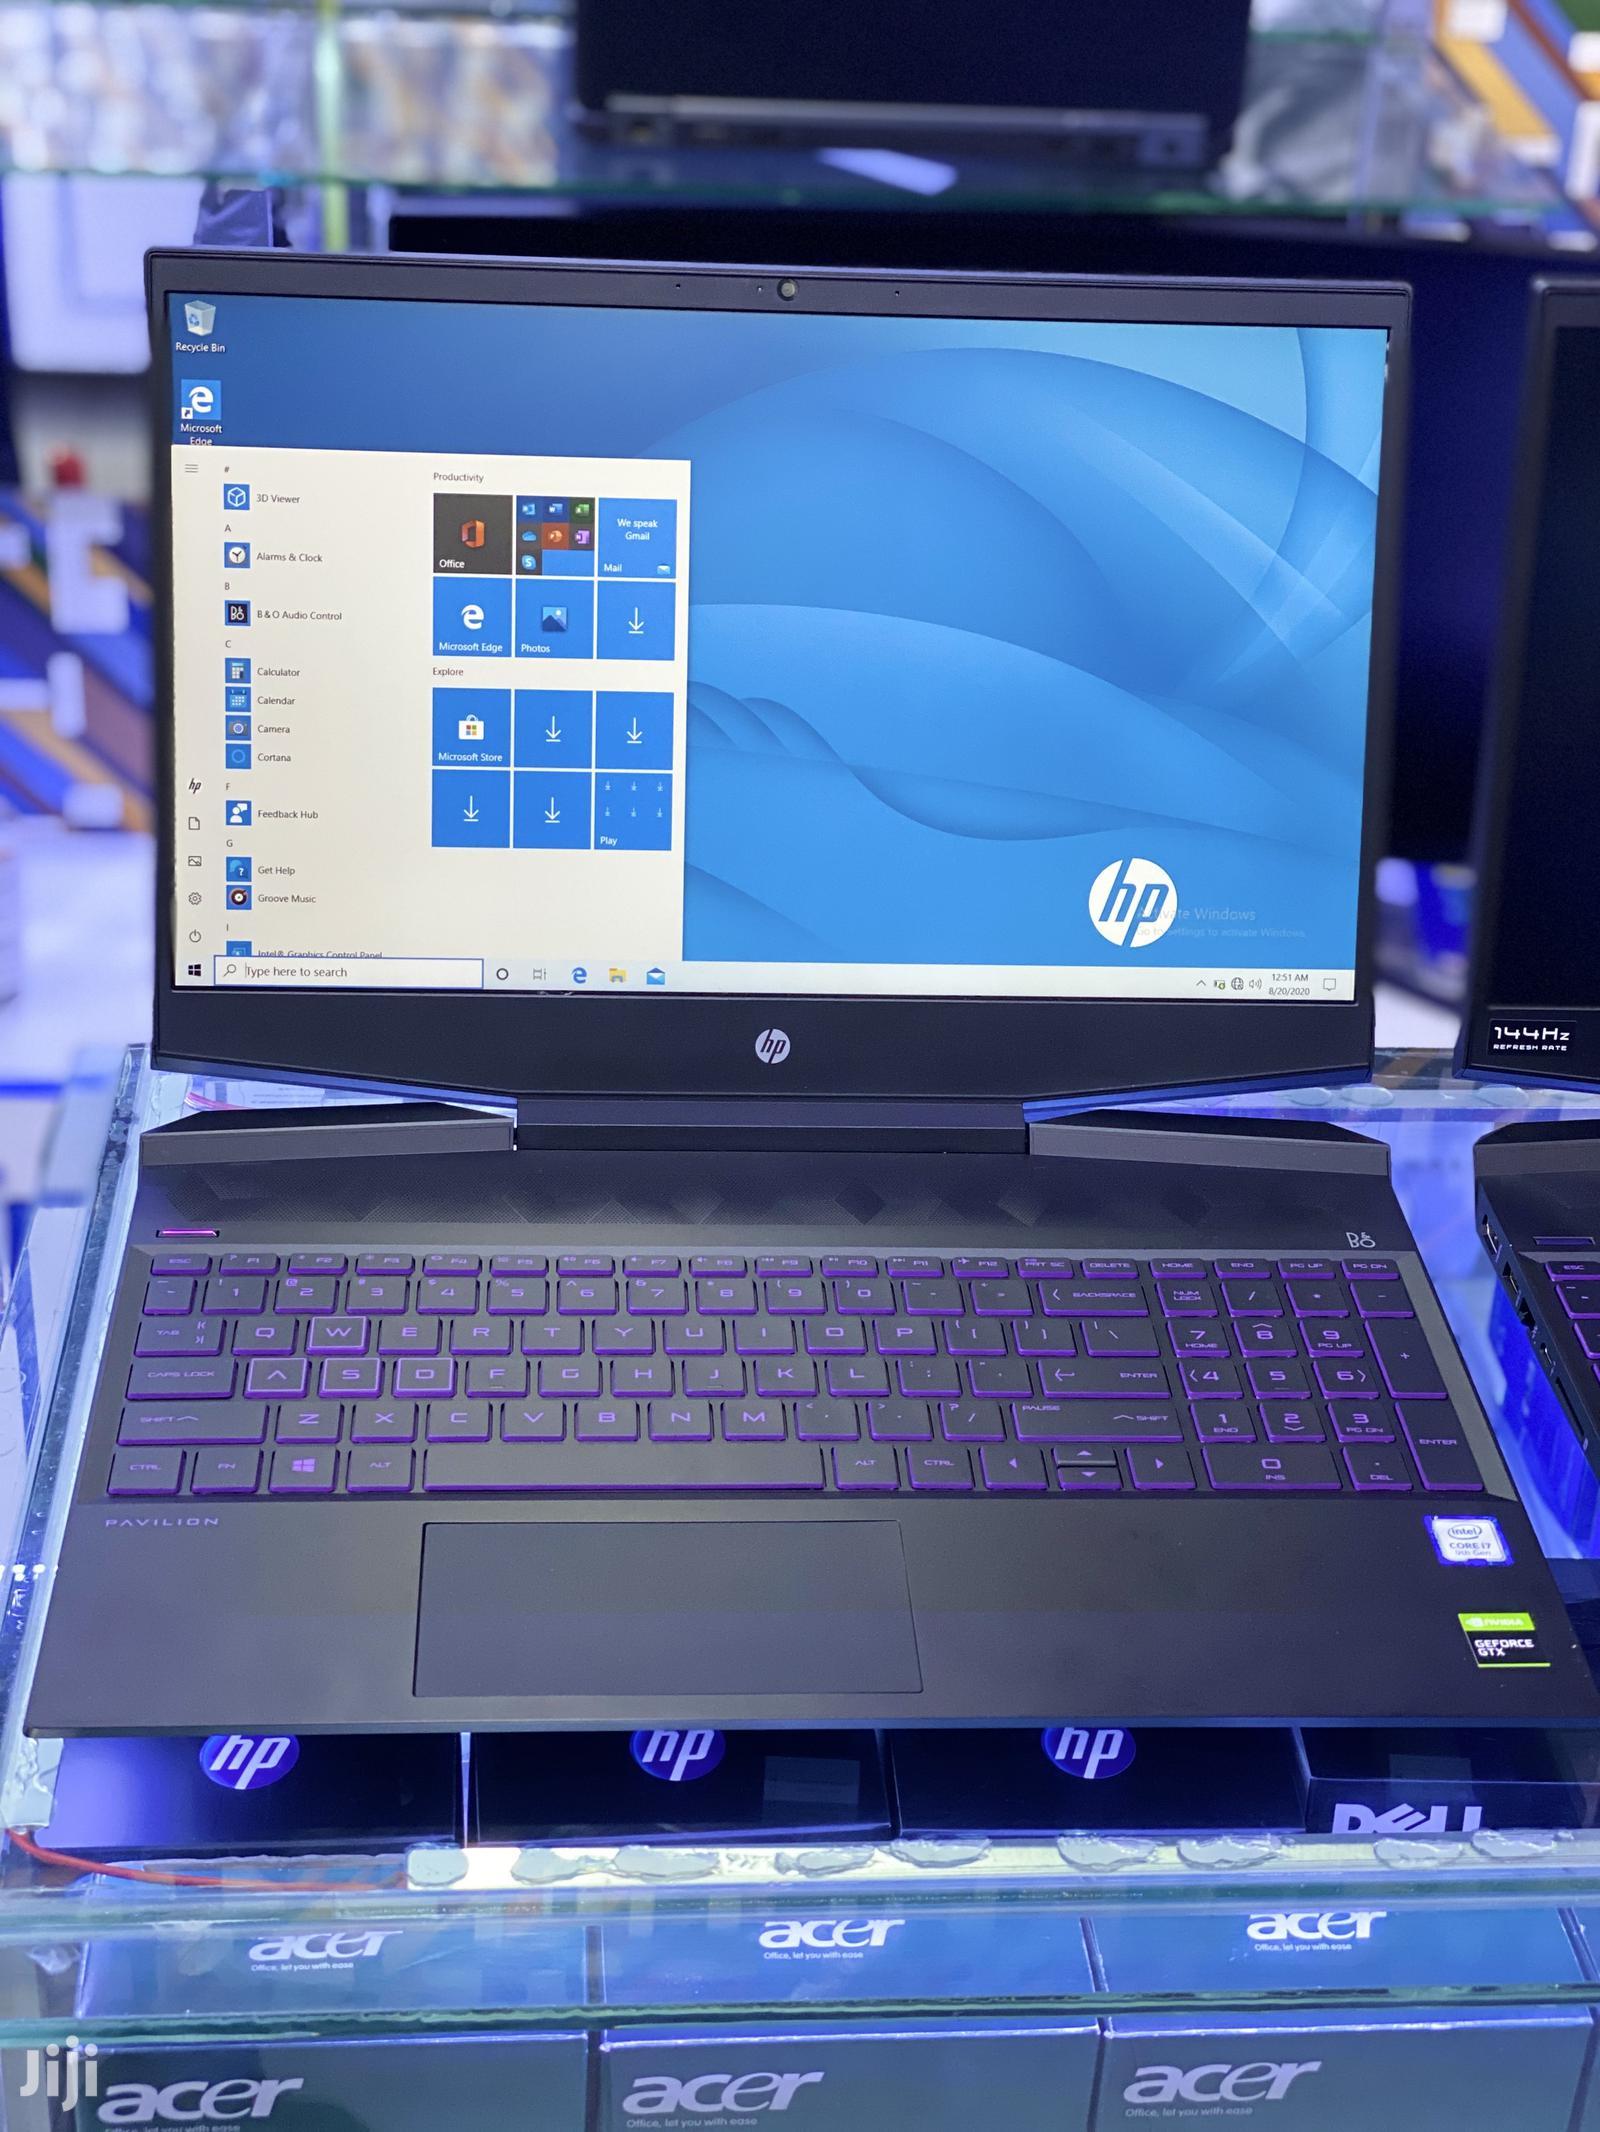 New Laptop HP Pavilion 15t 16GB Intel Core i7 SSD 1T